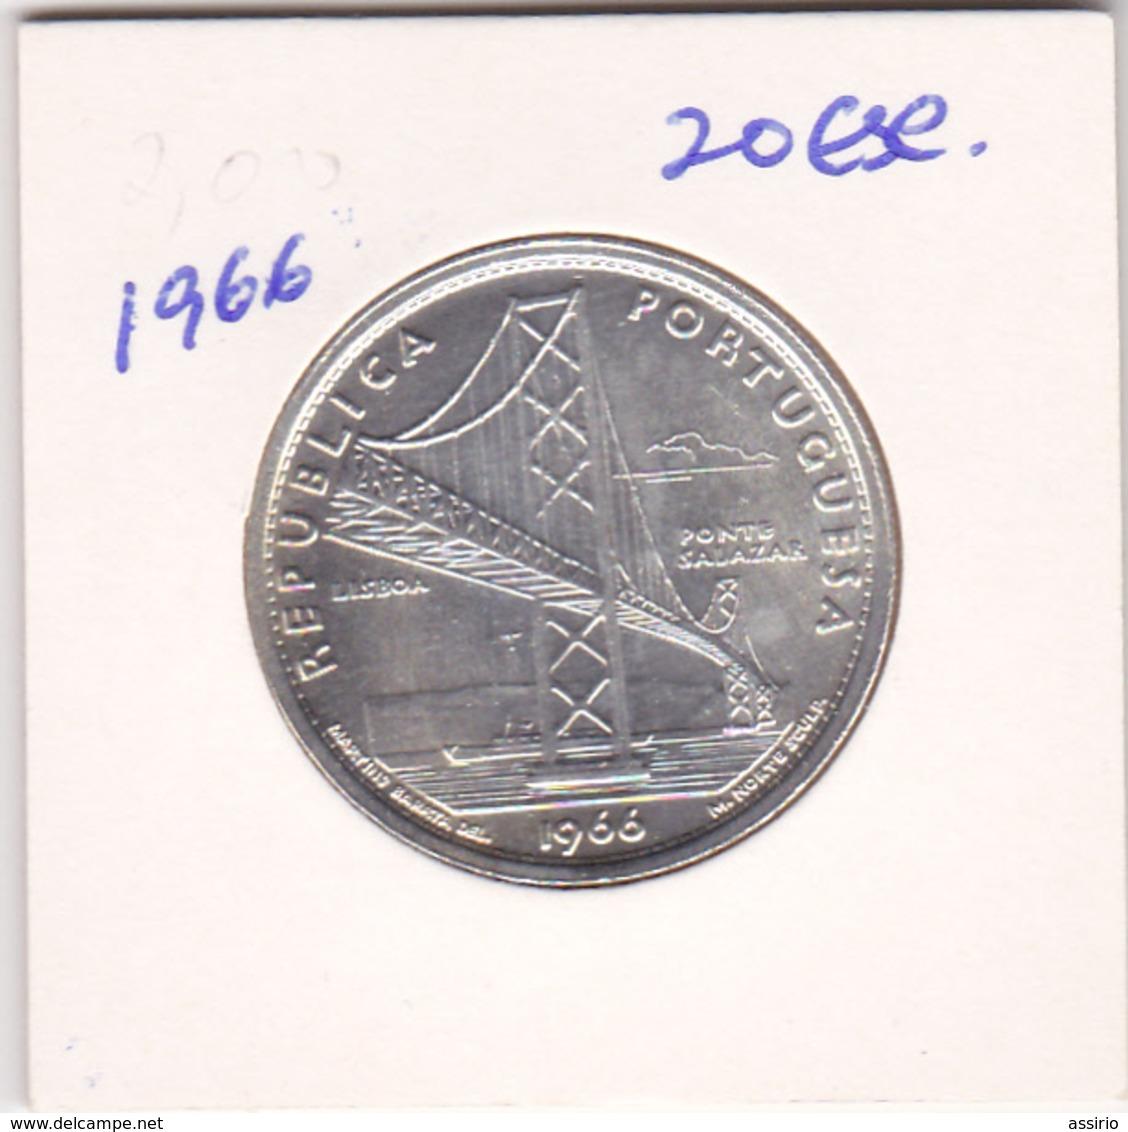 Portugal -Moeda De 20$00 -1966 - Portugal